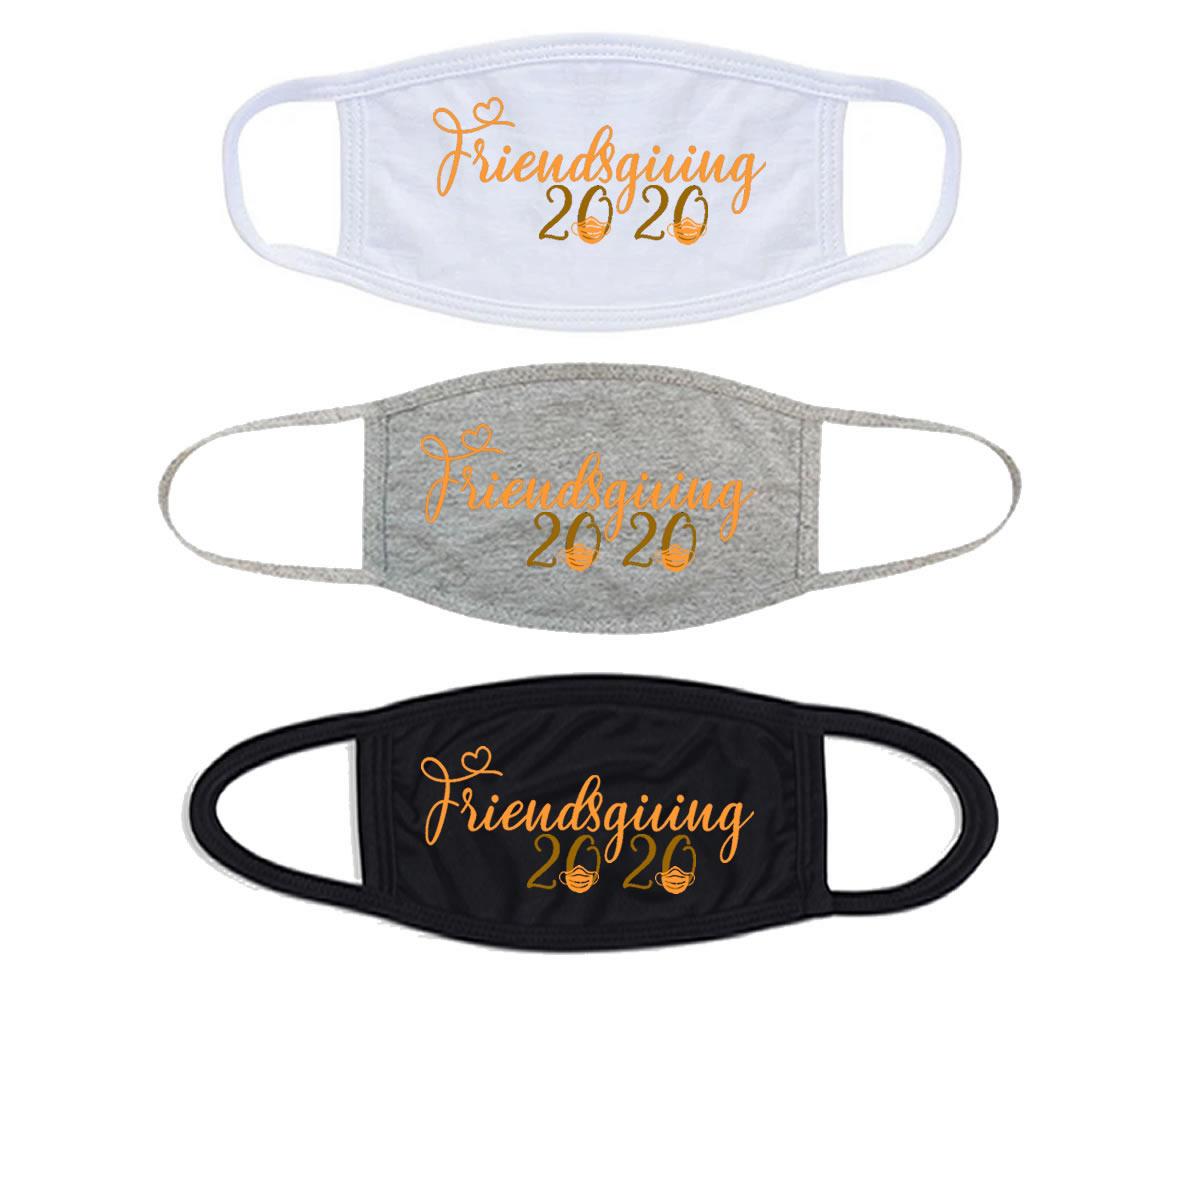 Friendsgiving 2020 Face Mask